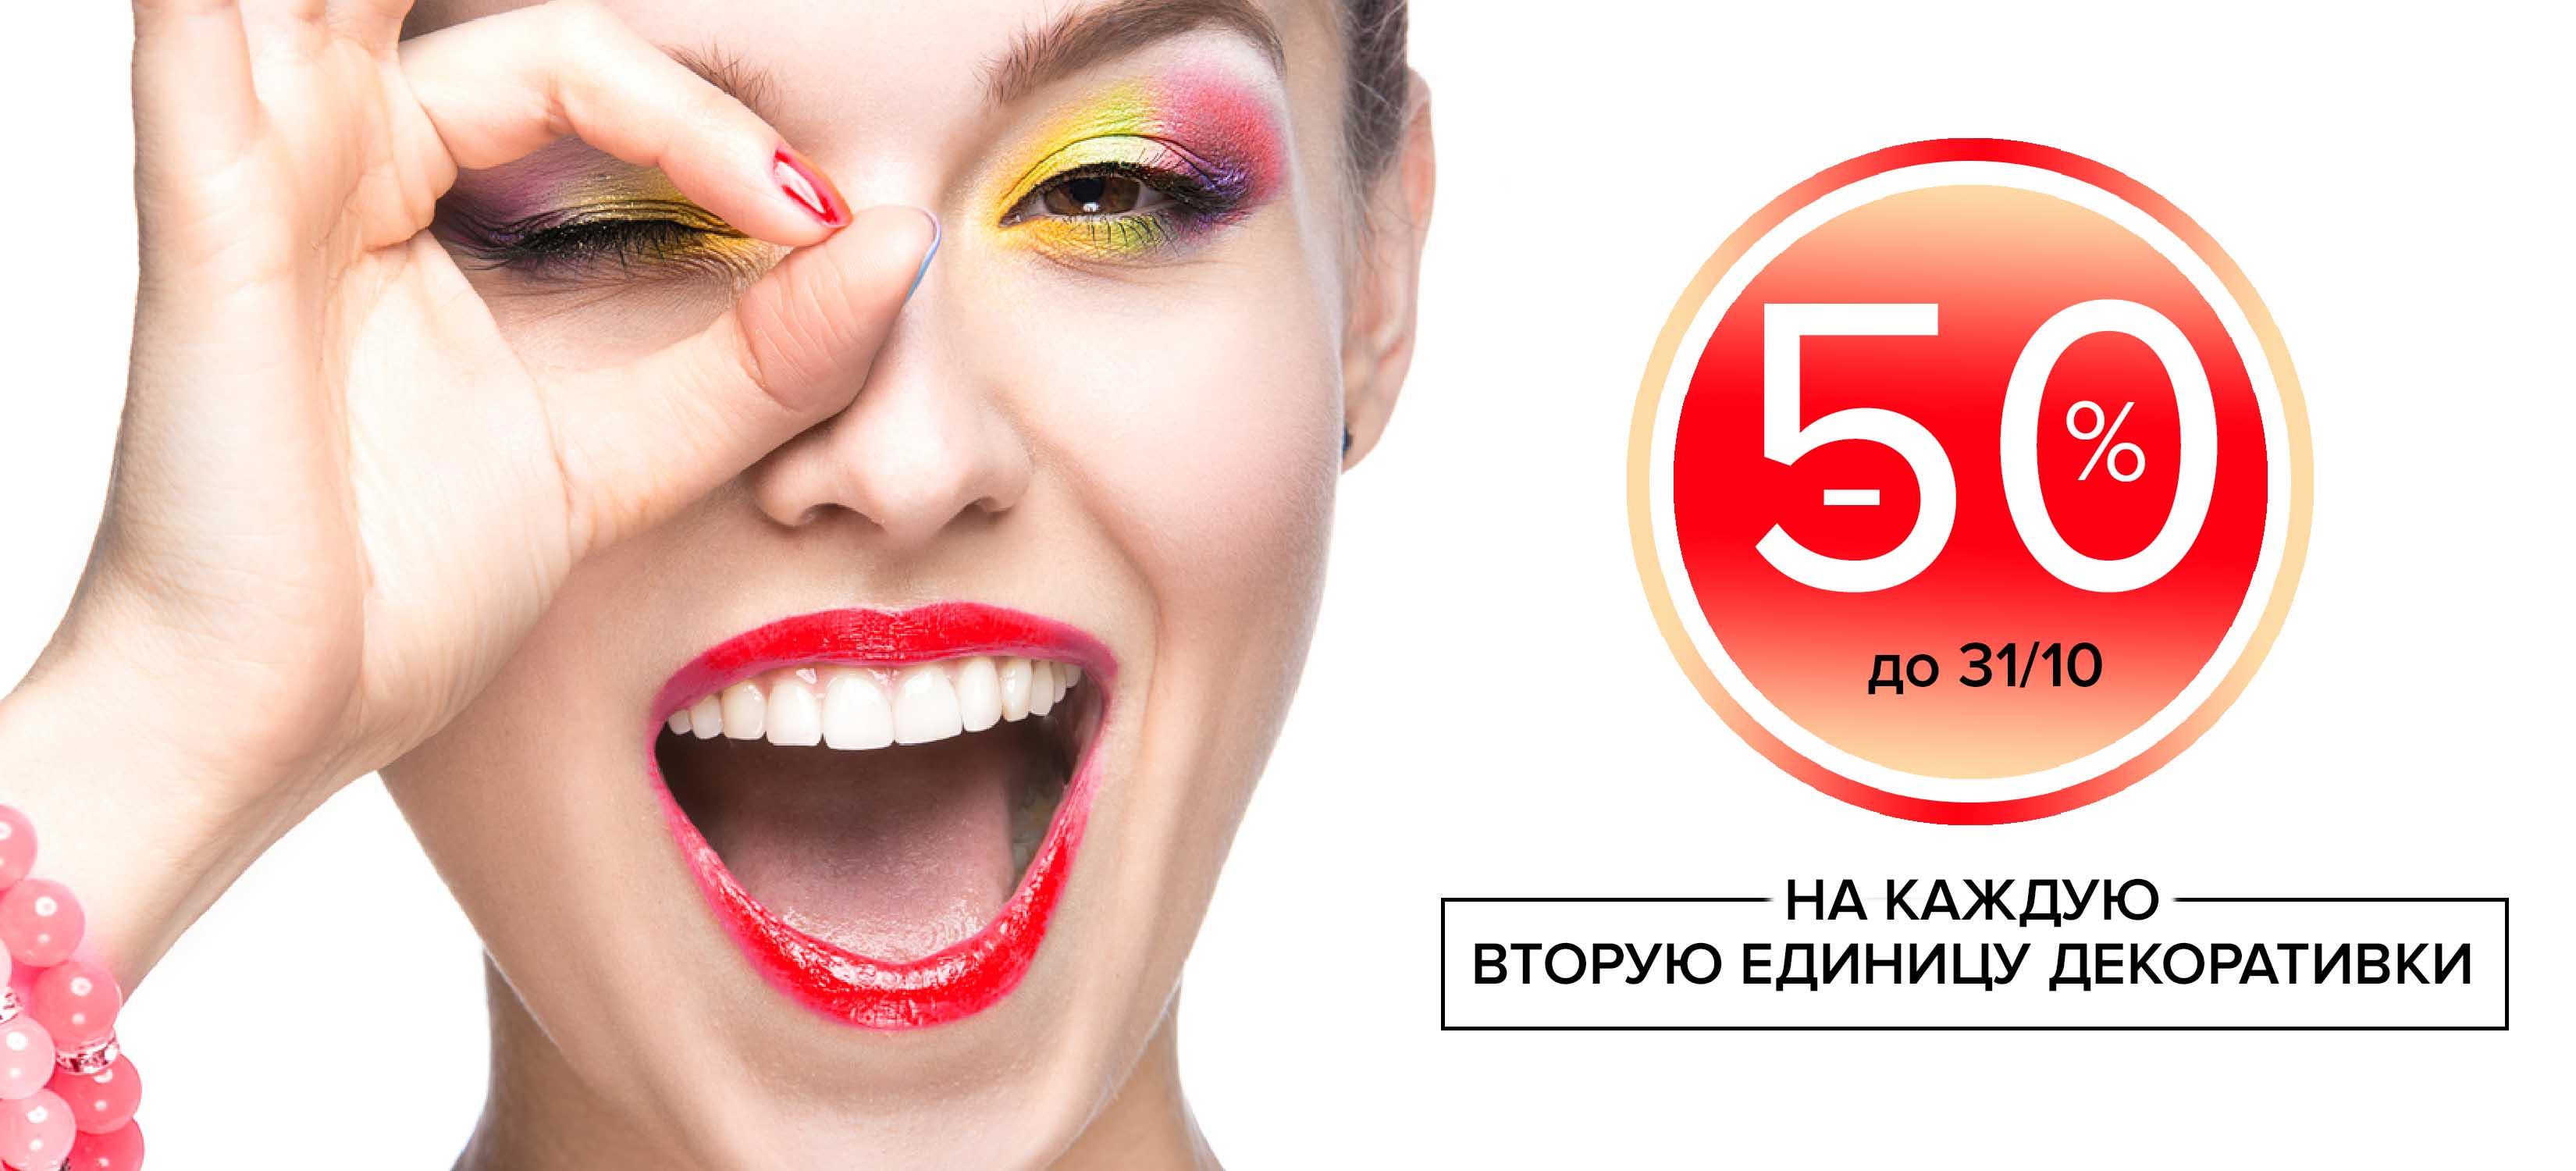 Акция на декоратиную косметику ОТОМЕ